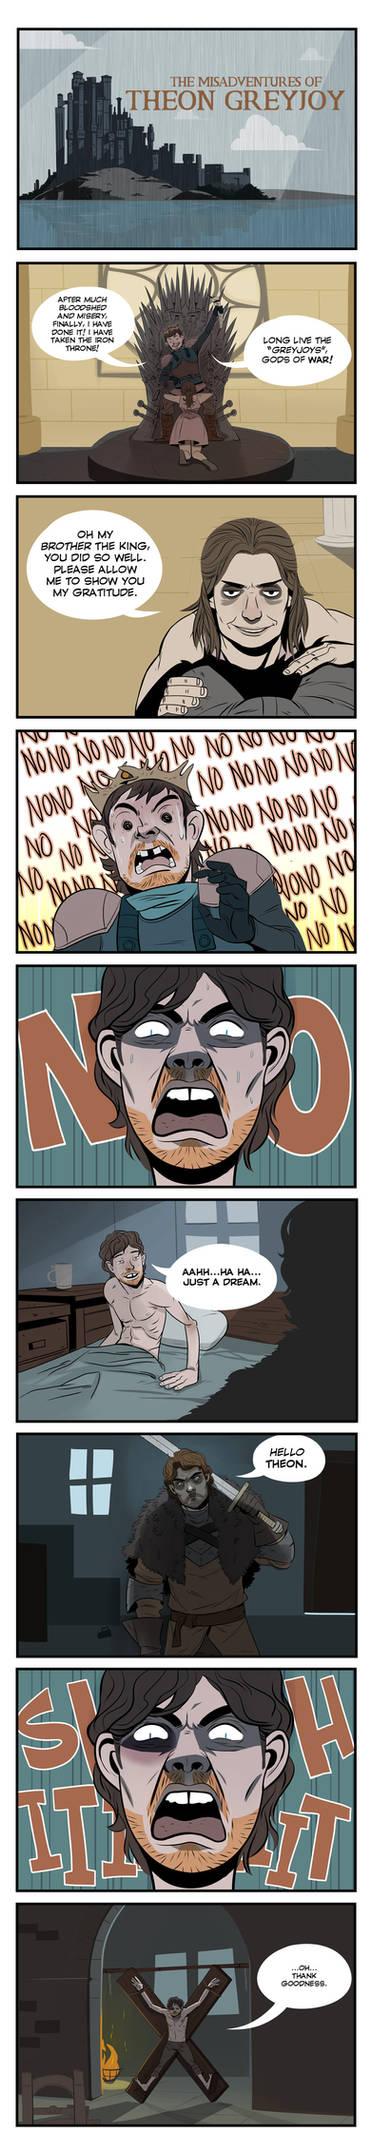 The Misdaventures of Theon Greyjoy